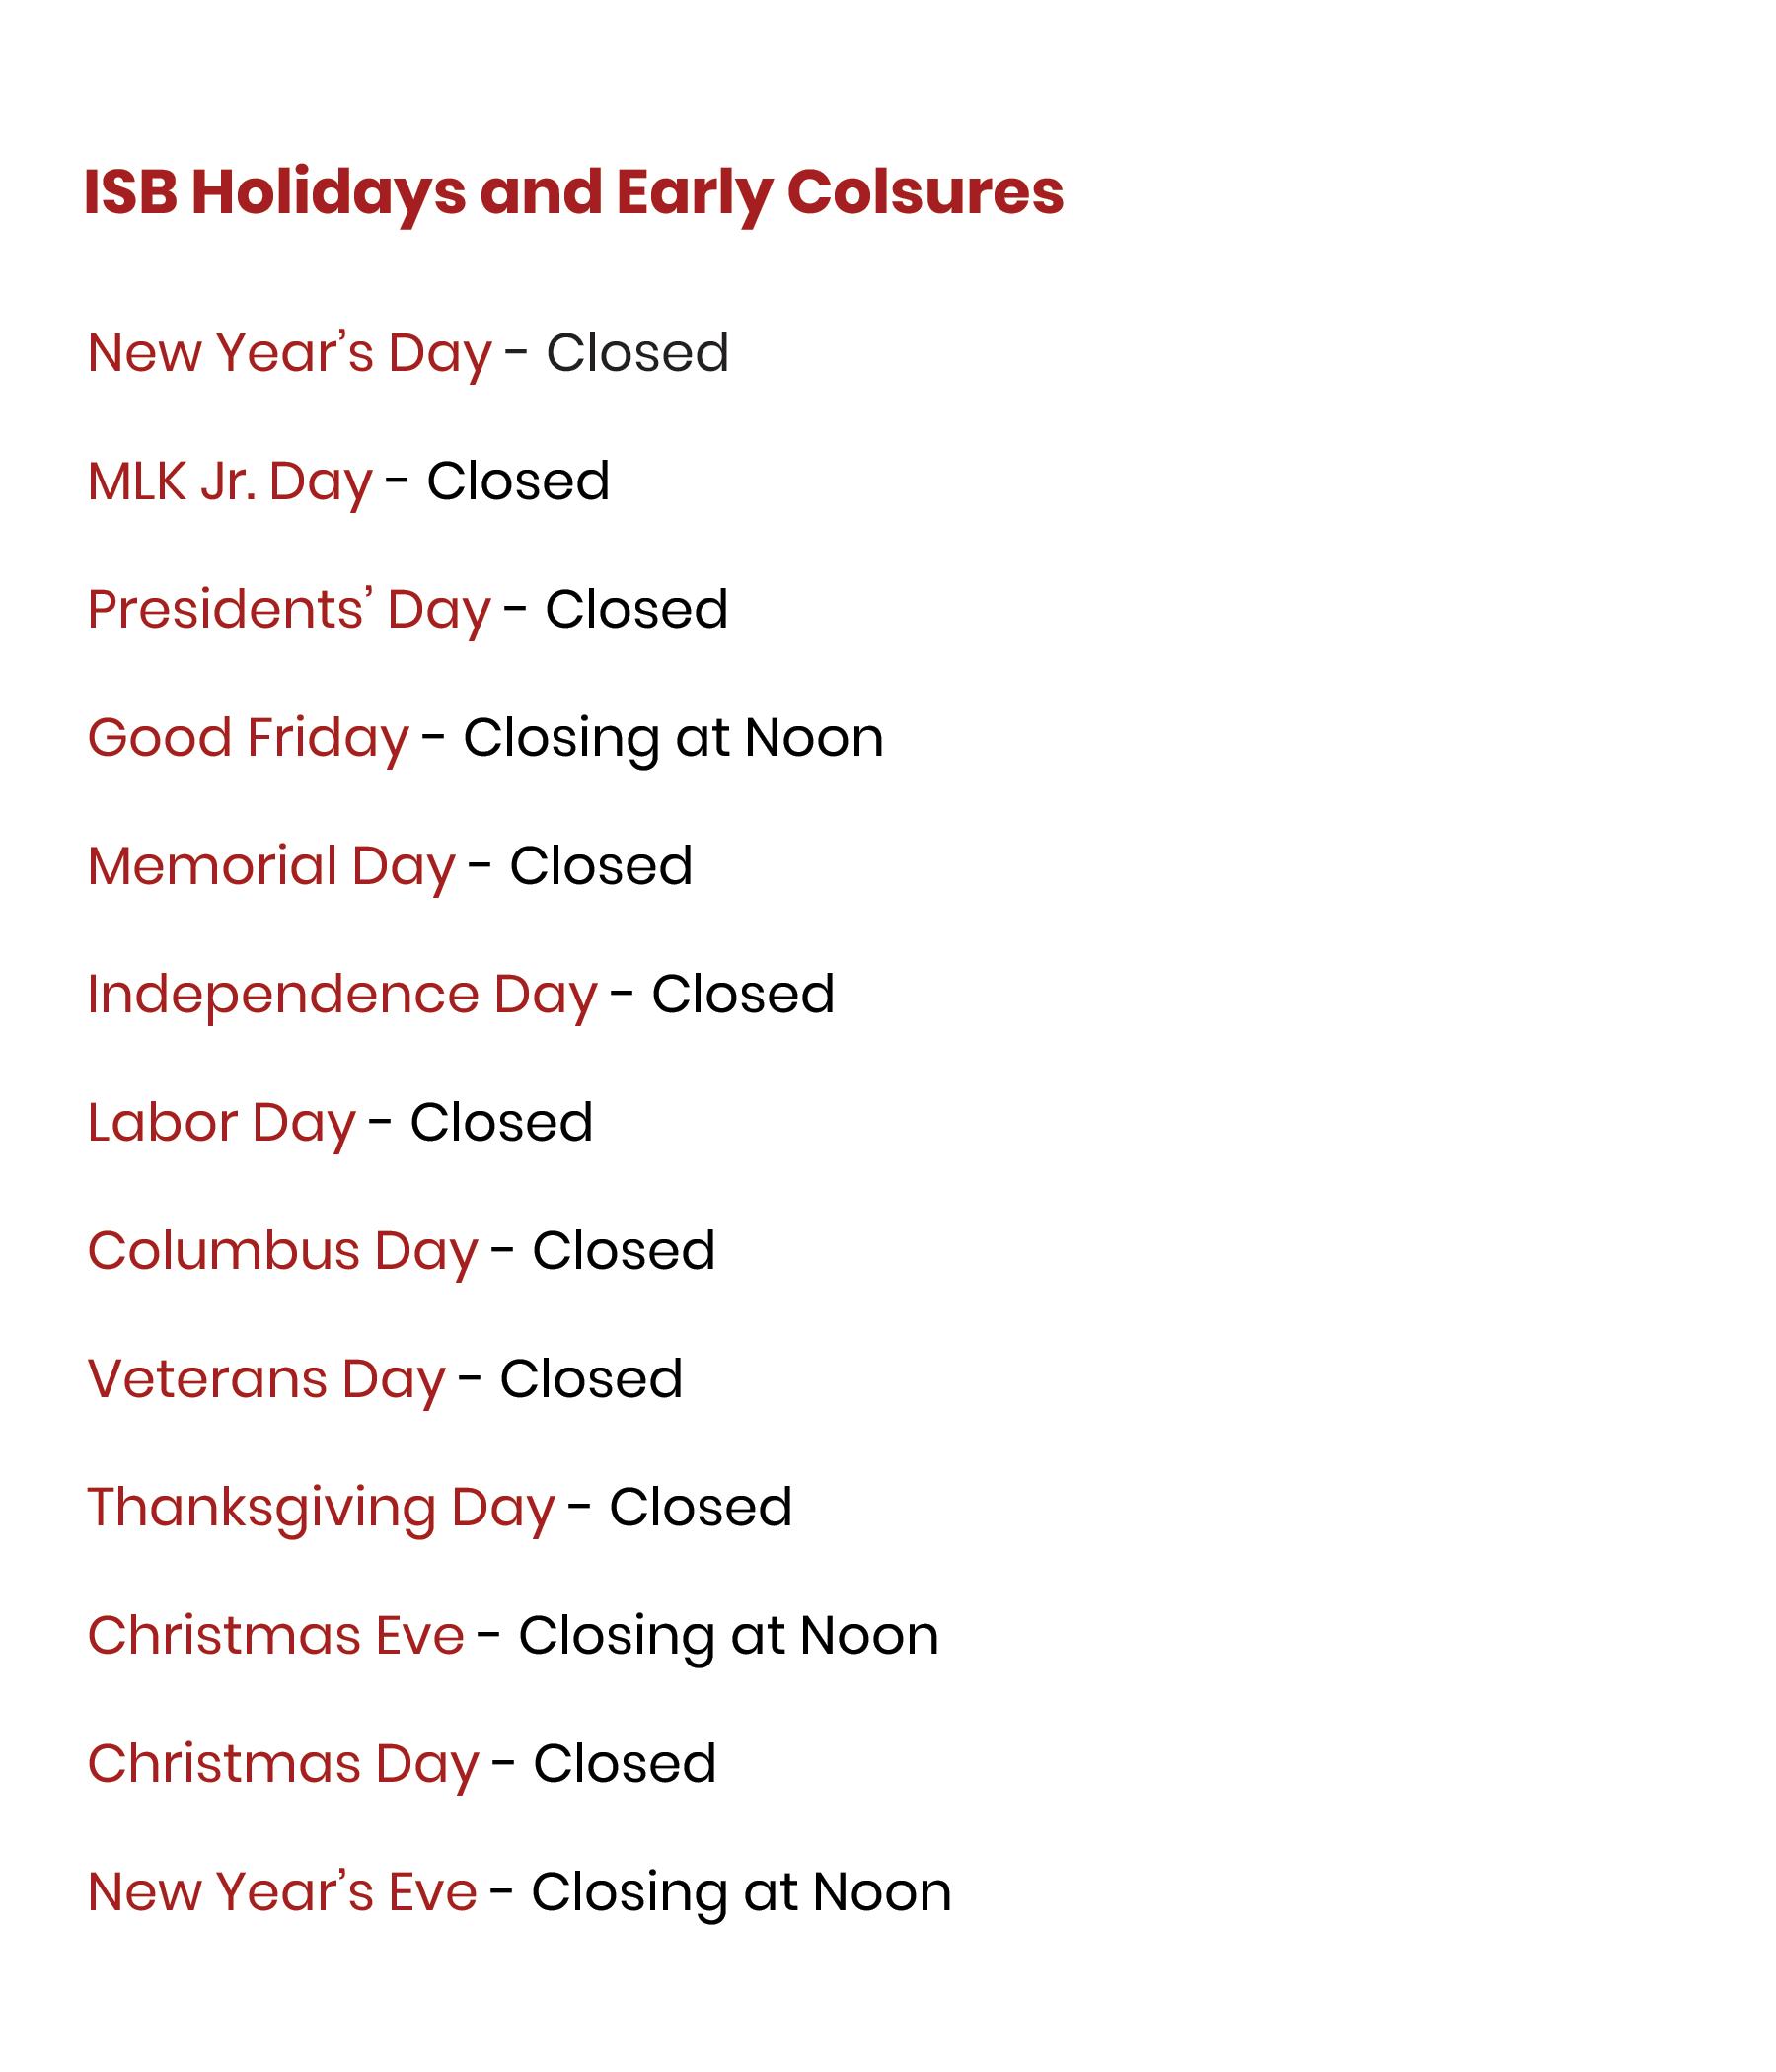 Bank Holidays and Early Closures